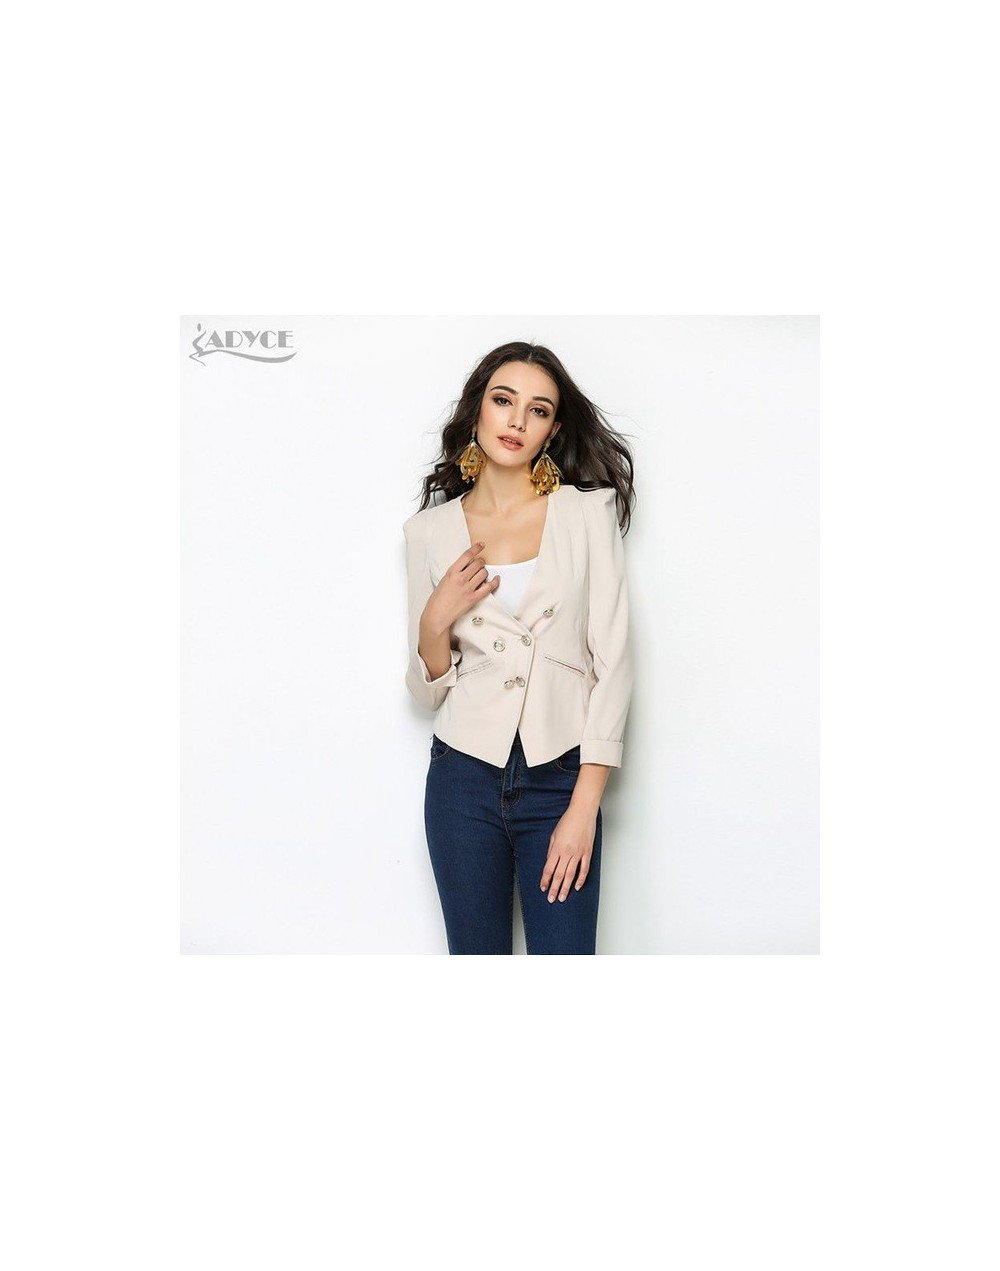 2019 New Summer Blazer Women Coat Apricot White Back Mesh Celebrity Runway Party Coats Elegant Lady Blazers - apricot - 4039...